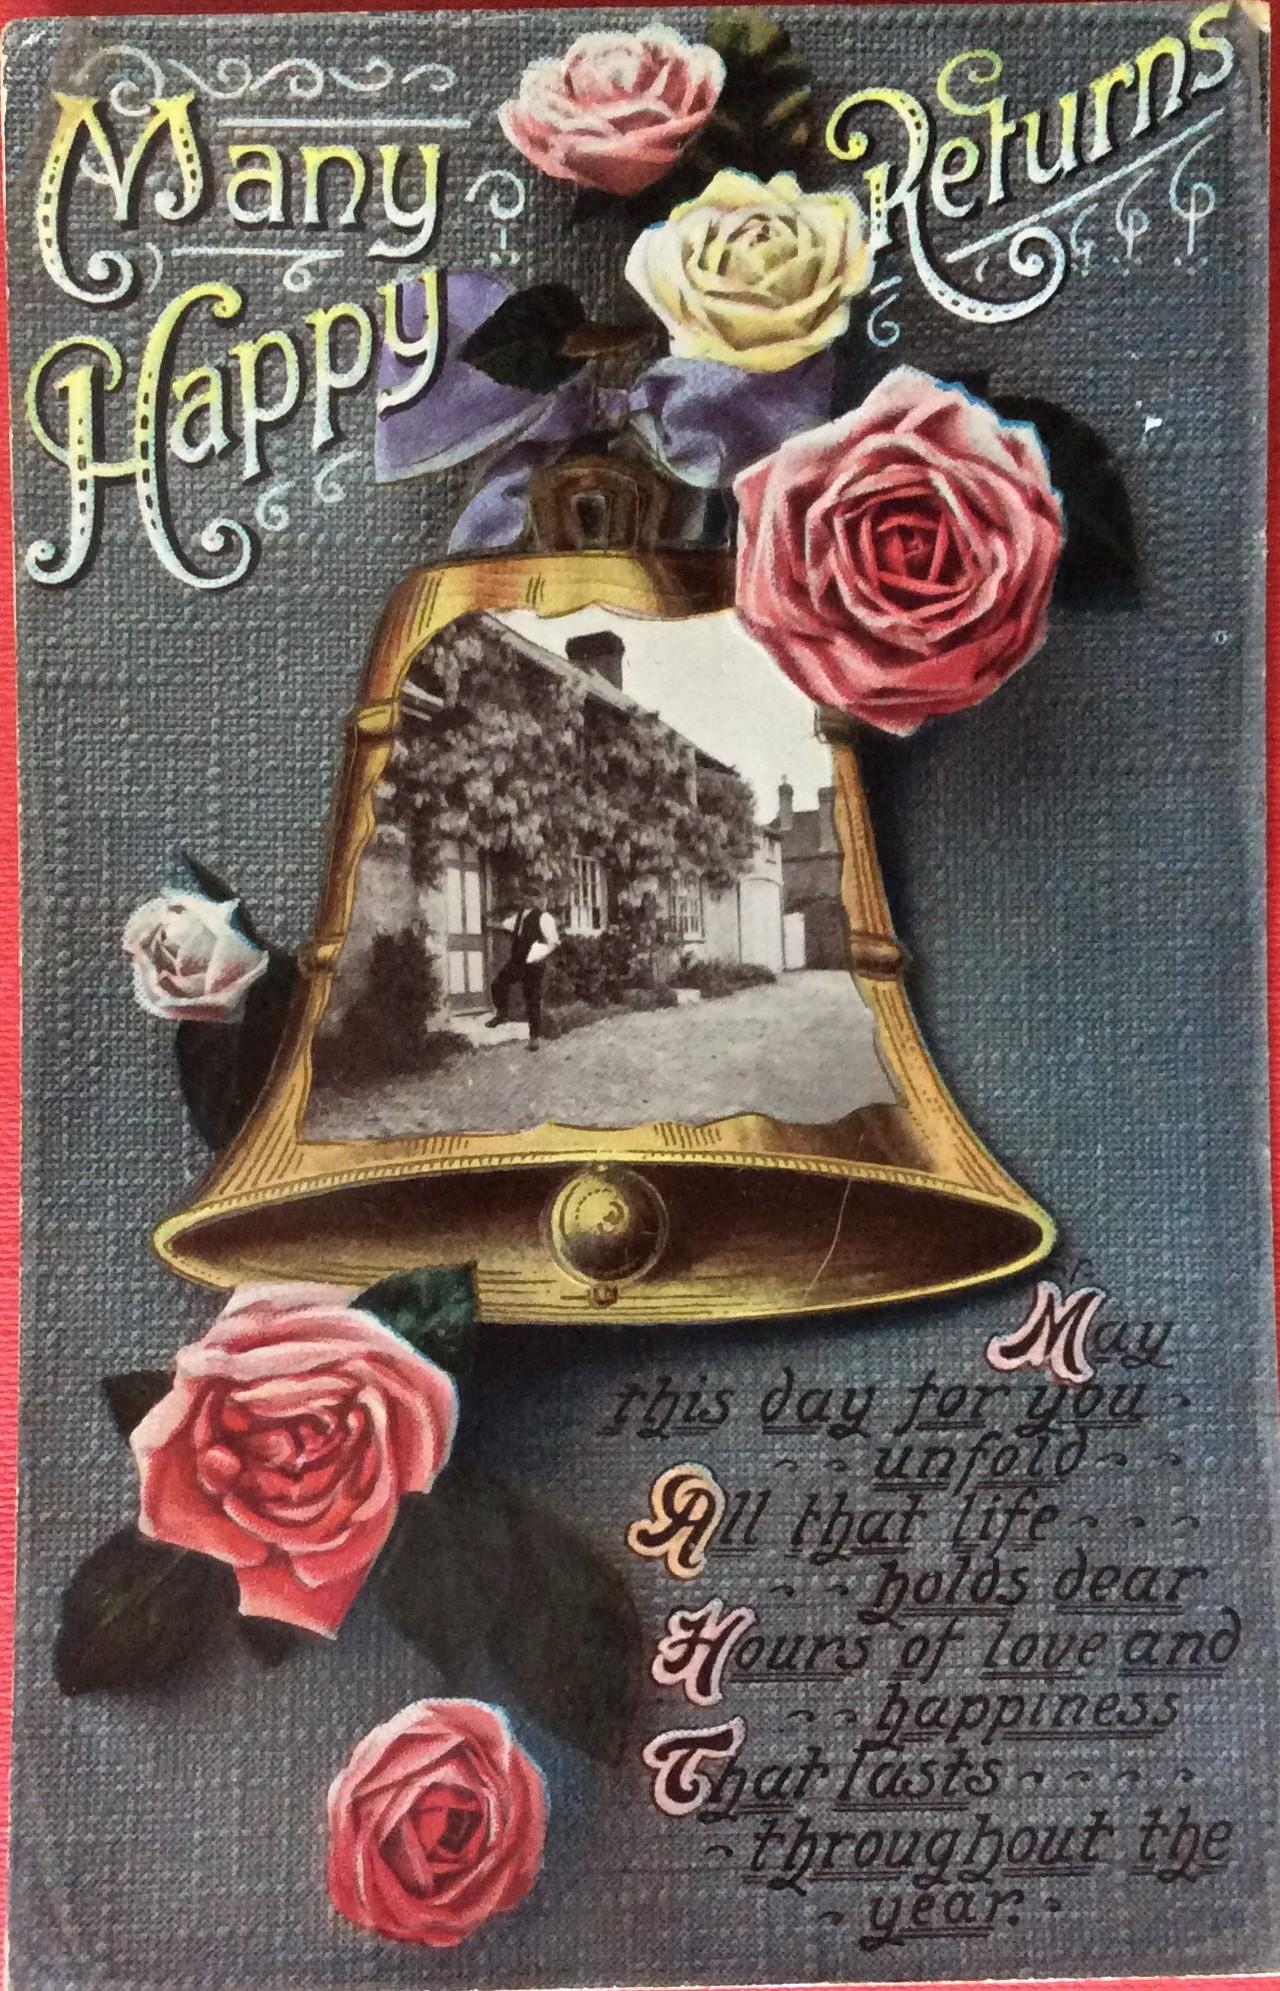 1914 An East End Mum's Birthday